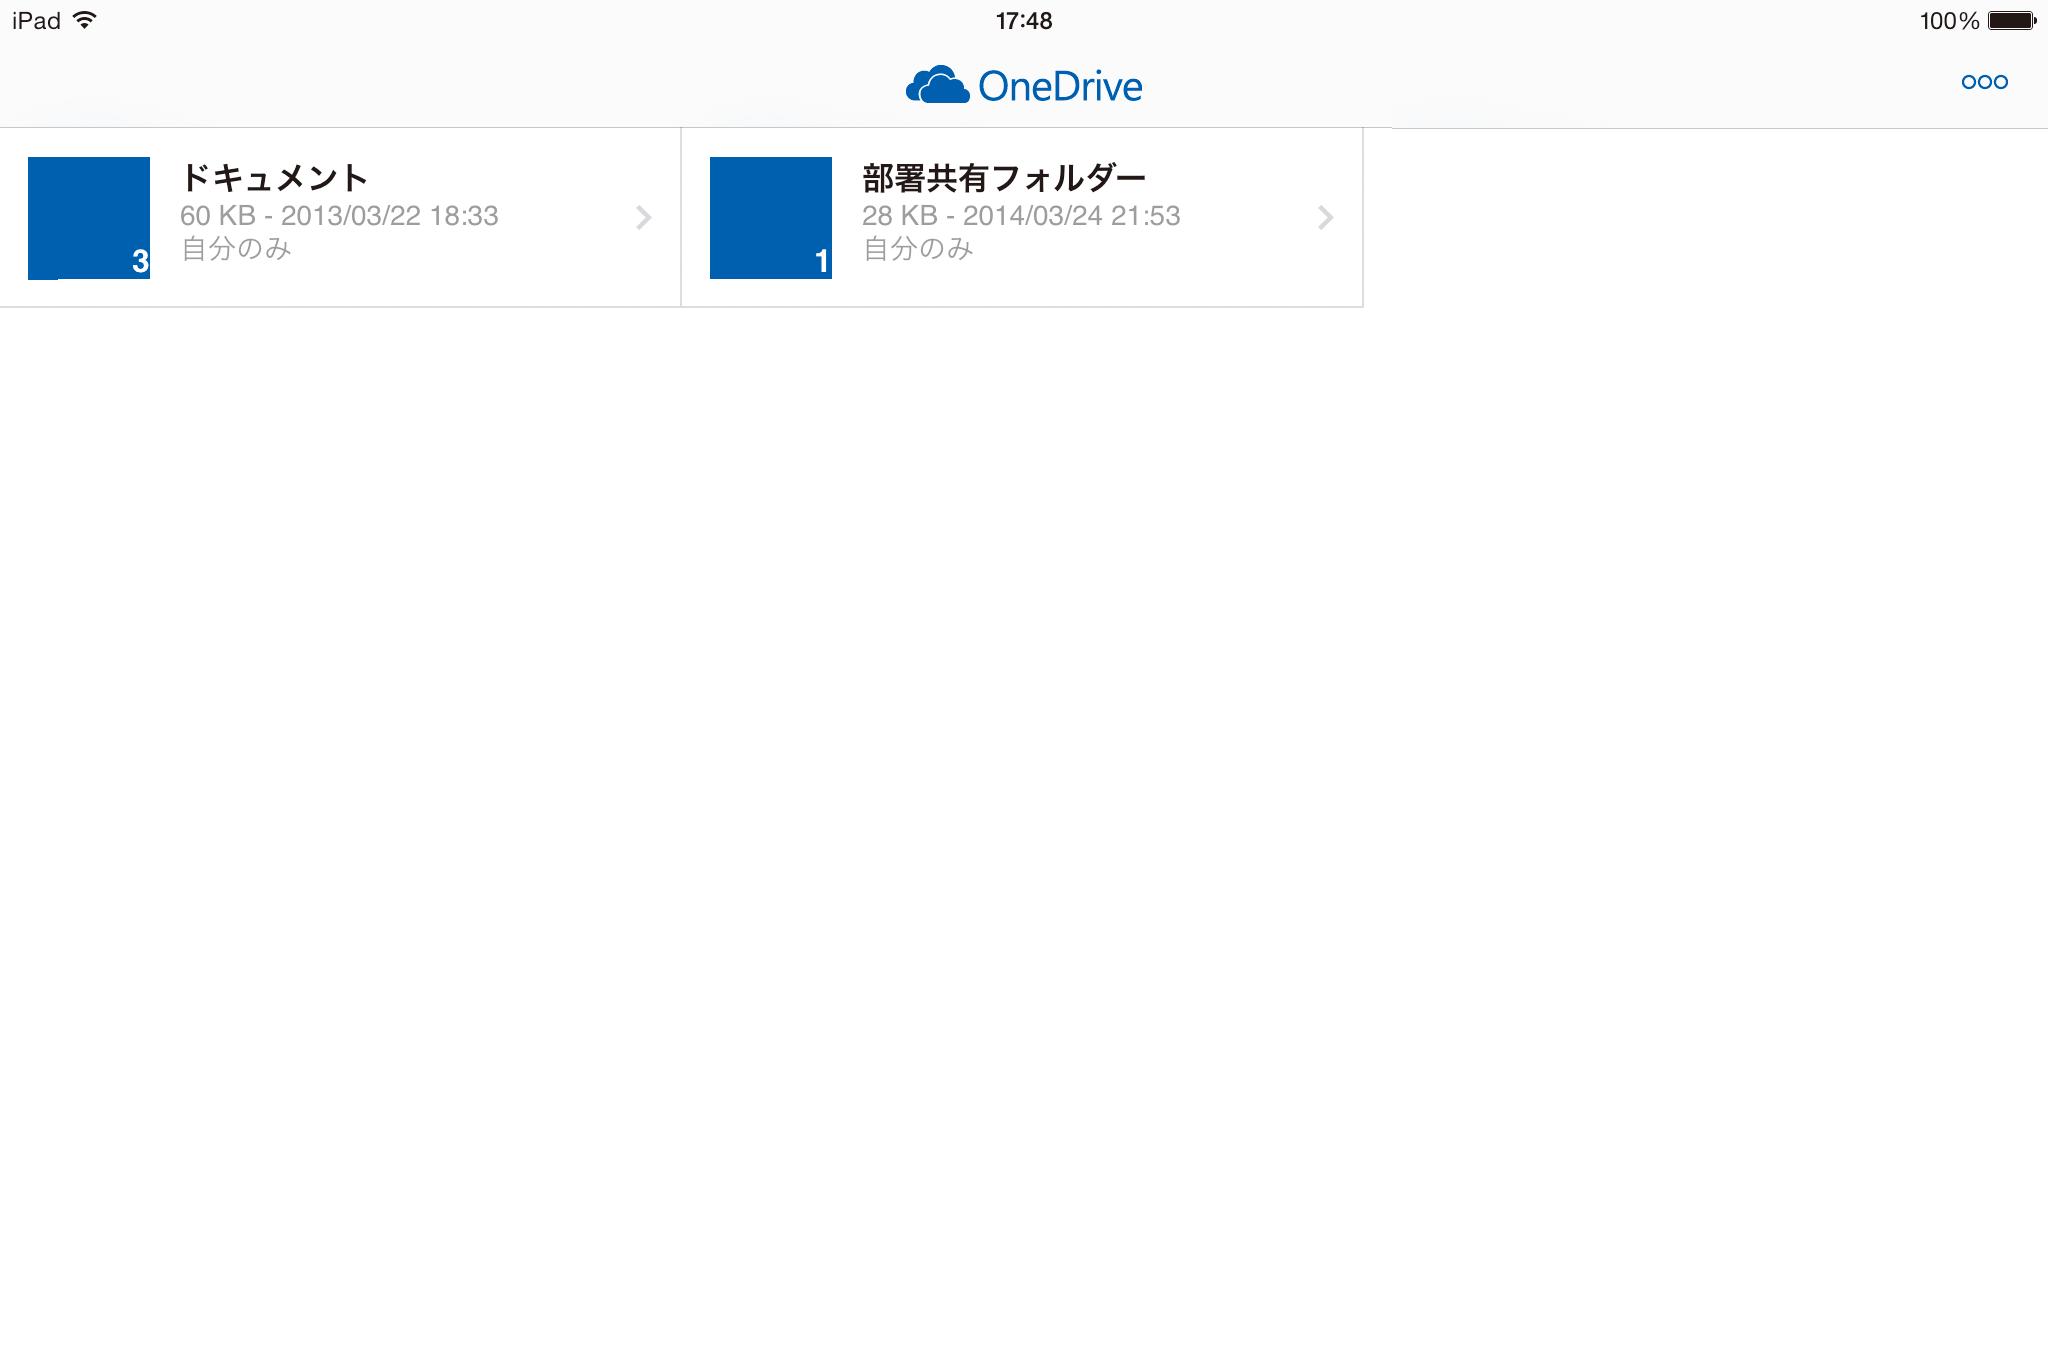 OneDriveの専用アプリをダウンロードする